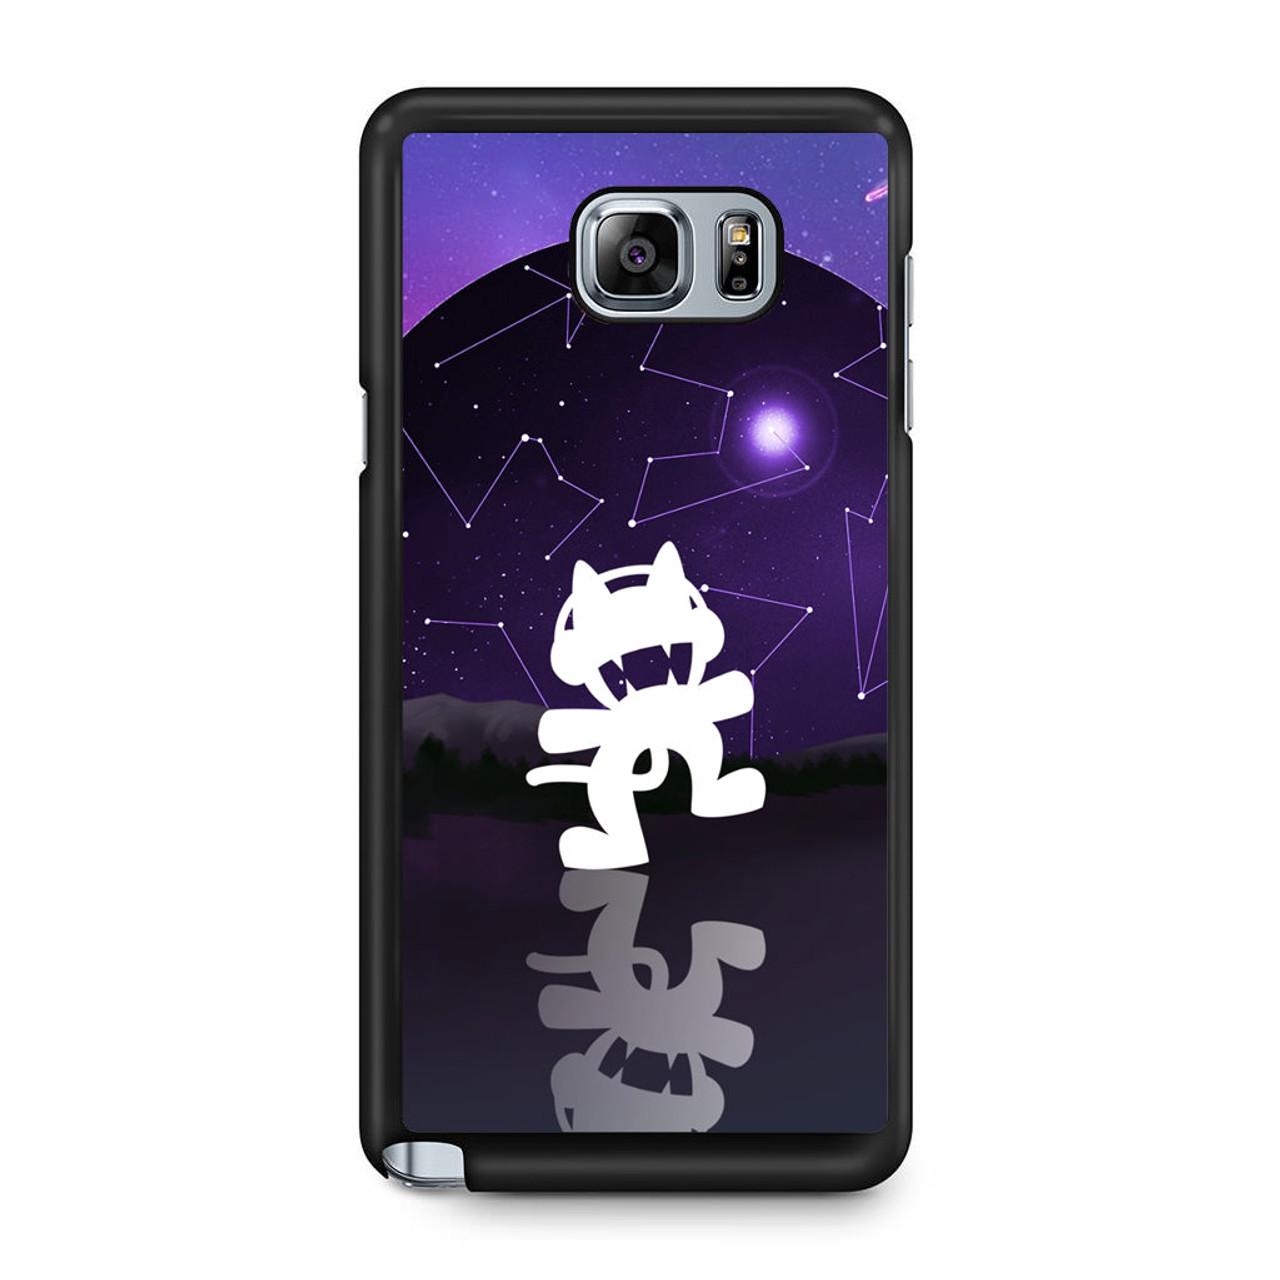 db0ffc591a96 Monstercat Samsung Galaxy Note 5 Case - CASESHUNTER